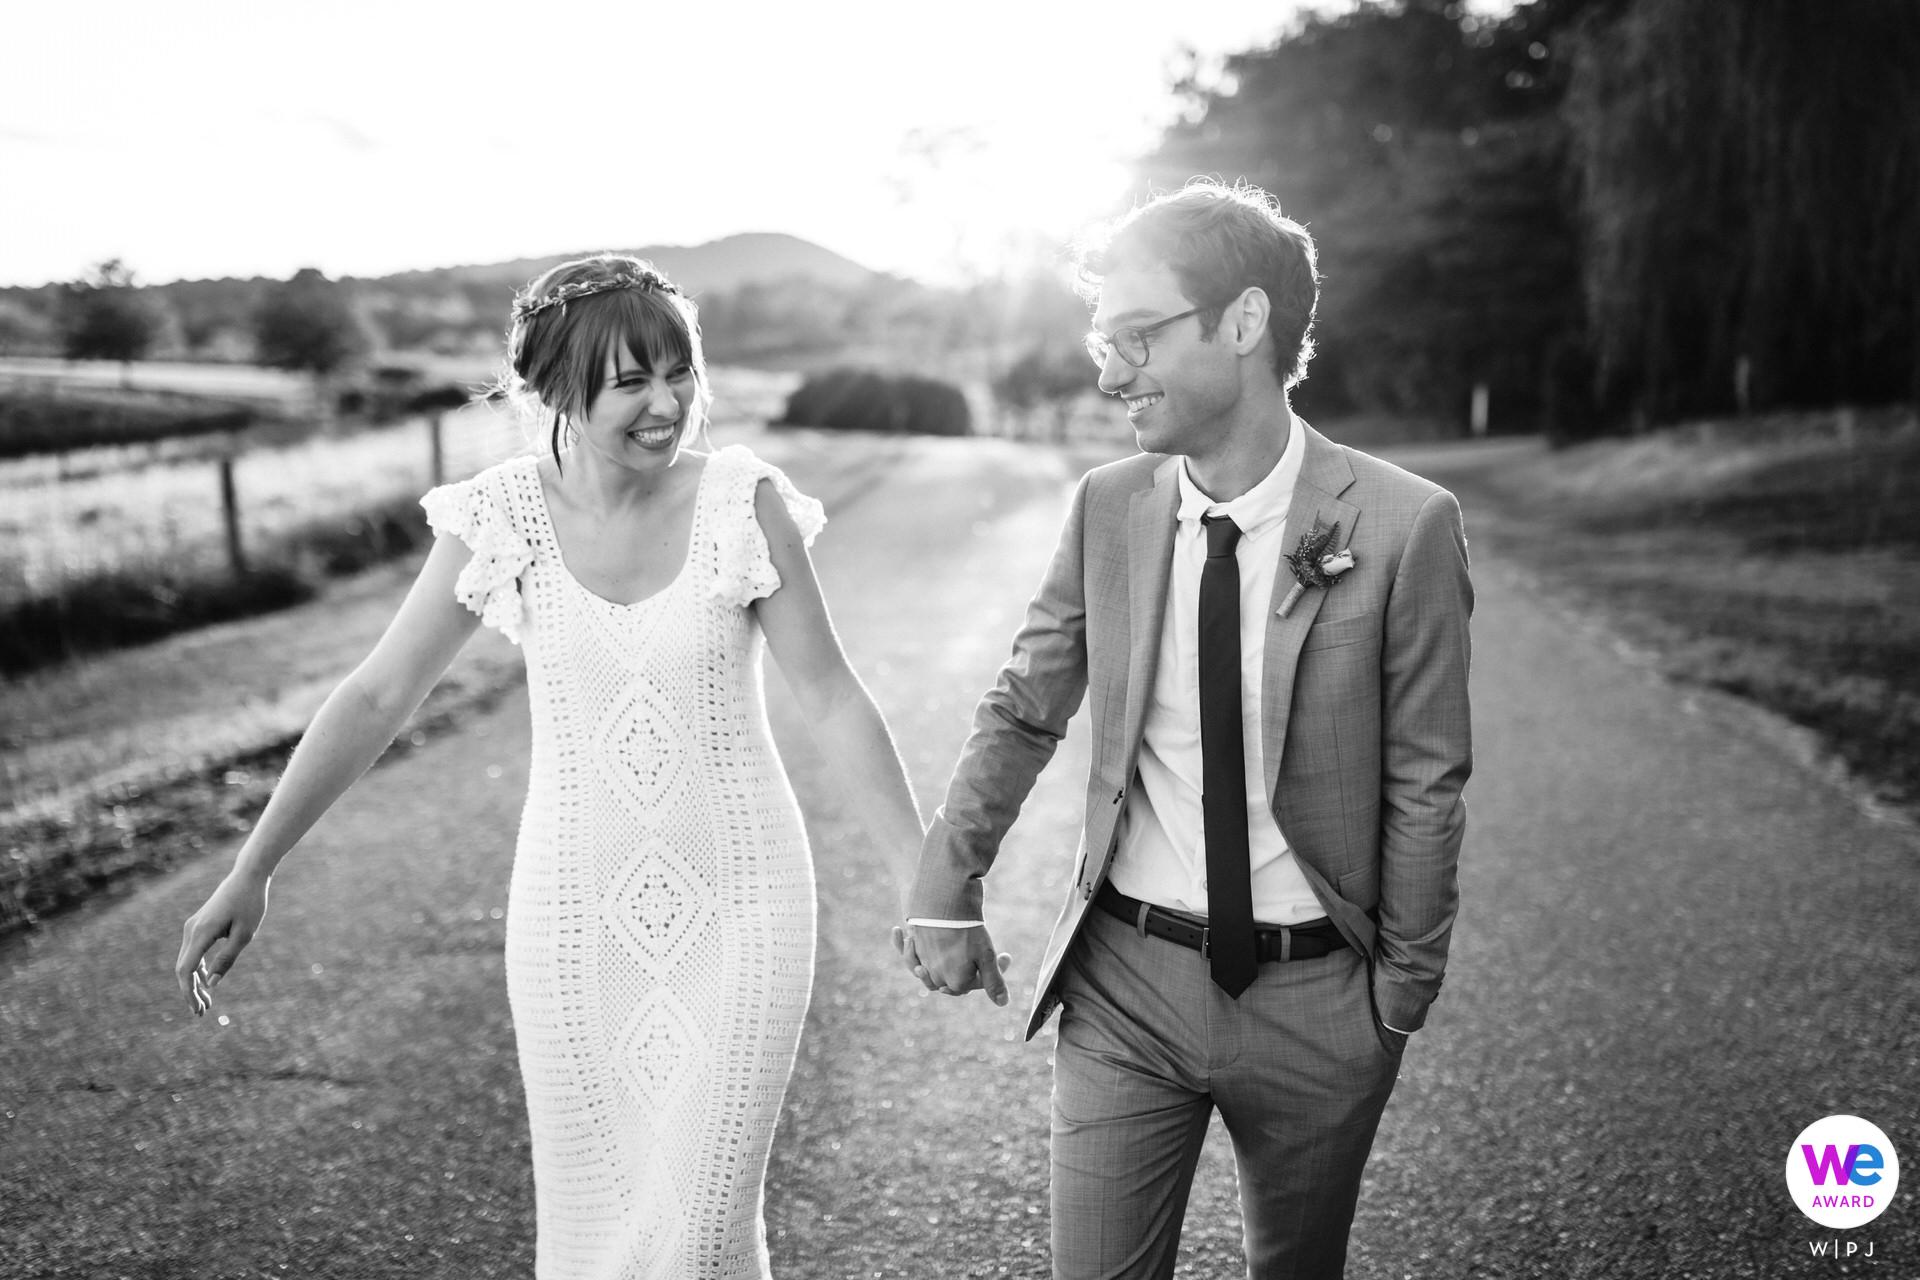 Wedding Couple Portrait in Charlottesville, VA | Sunset portrait of the bride and groom